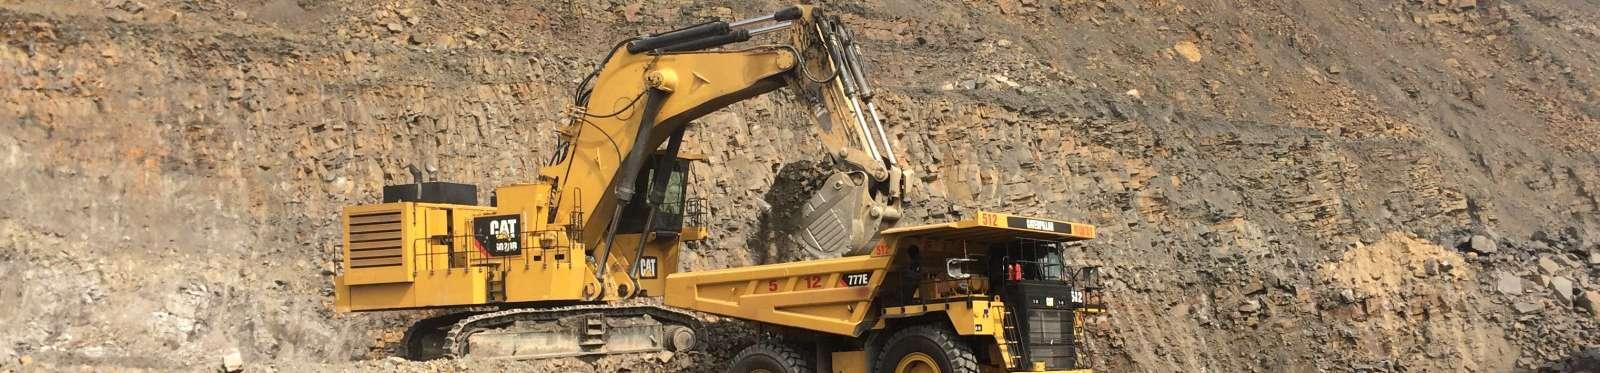 Máy xúc đào khai mỏ Cat